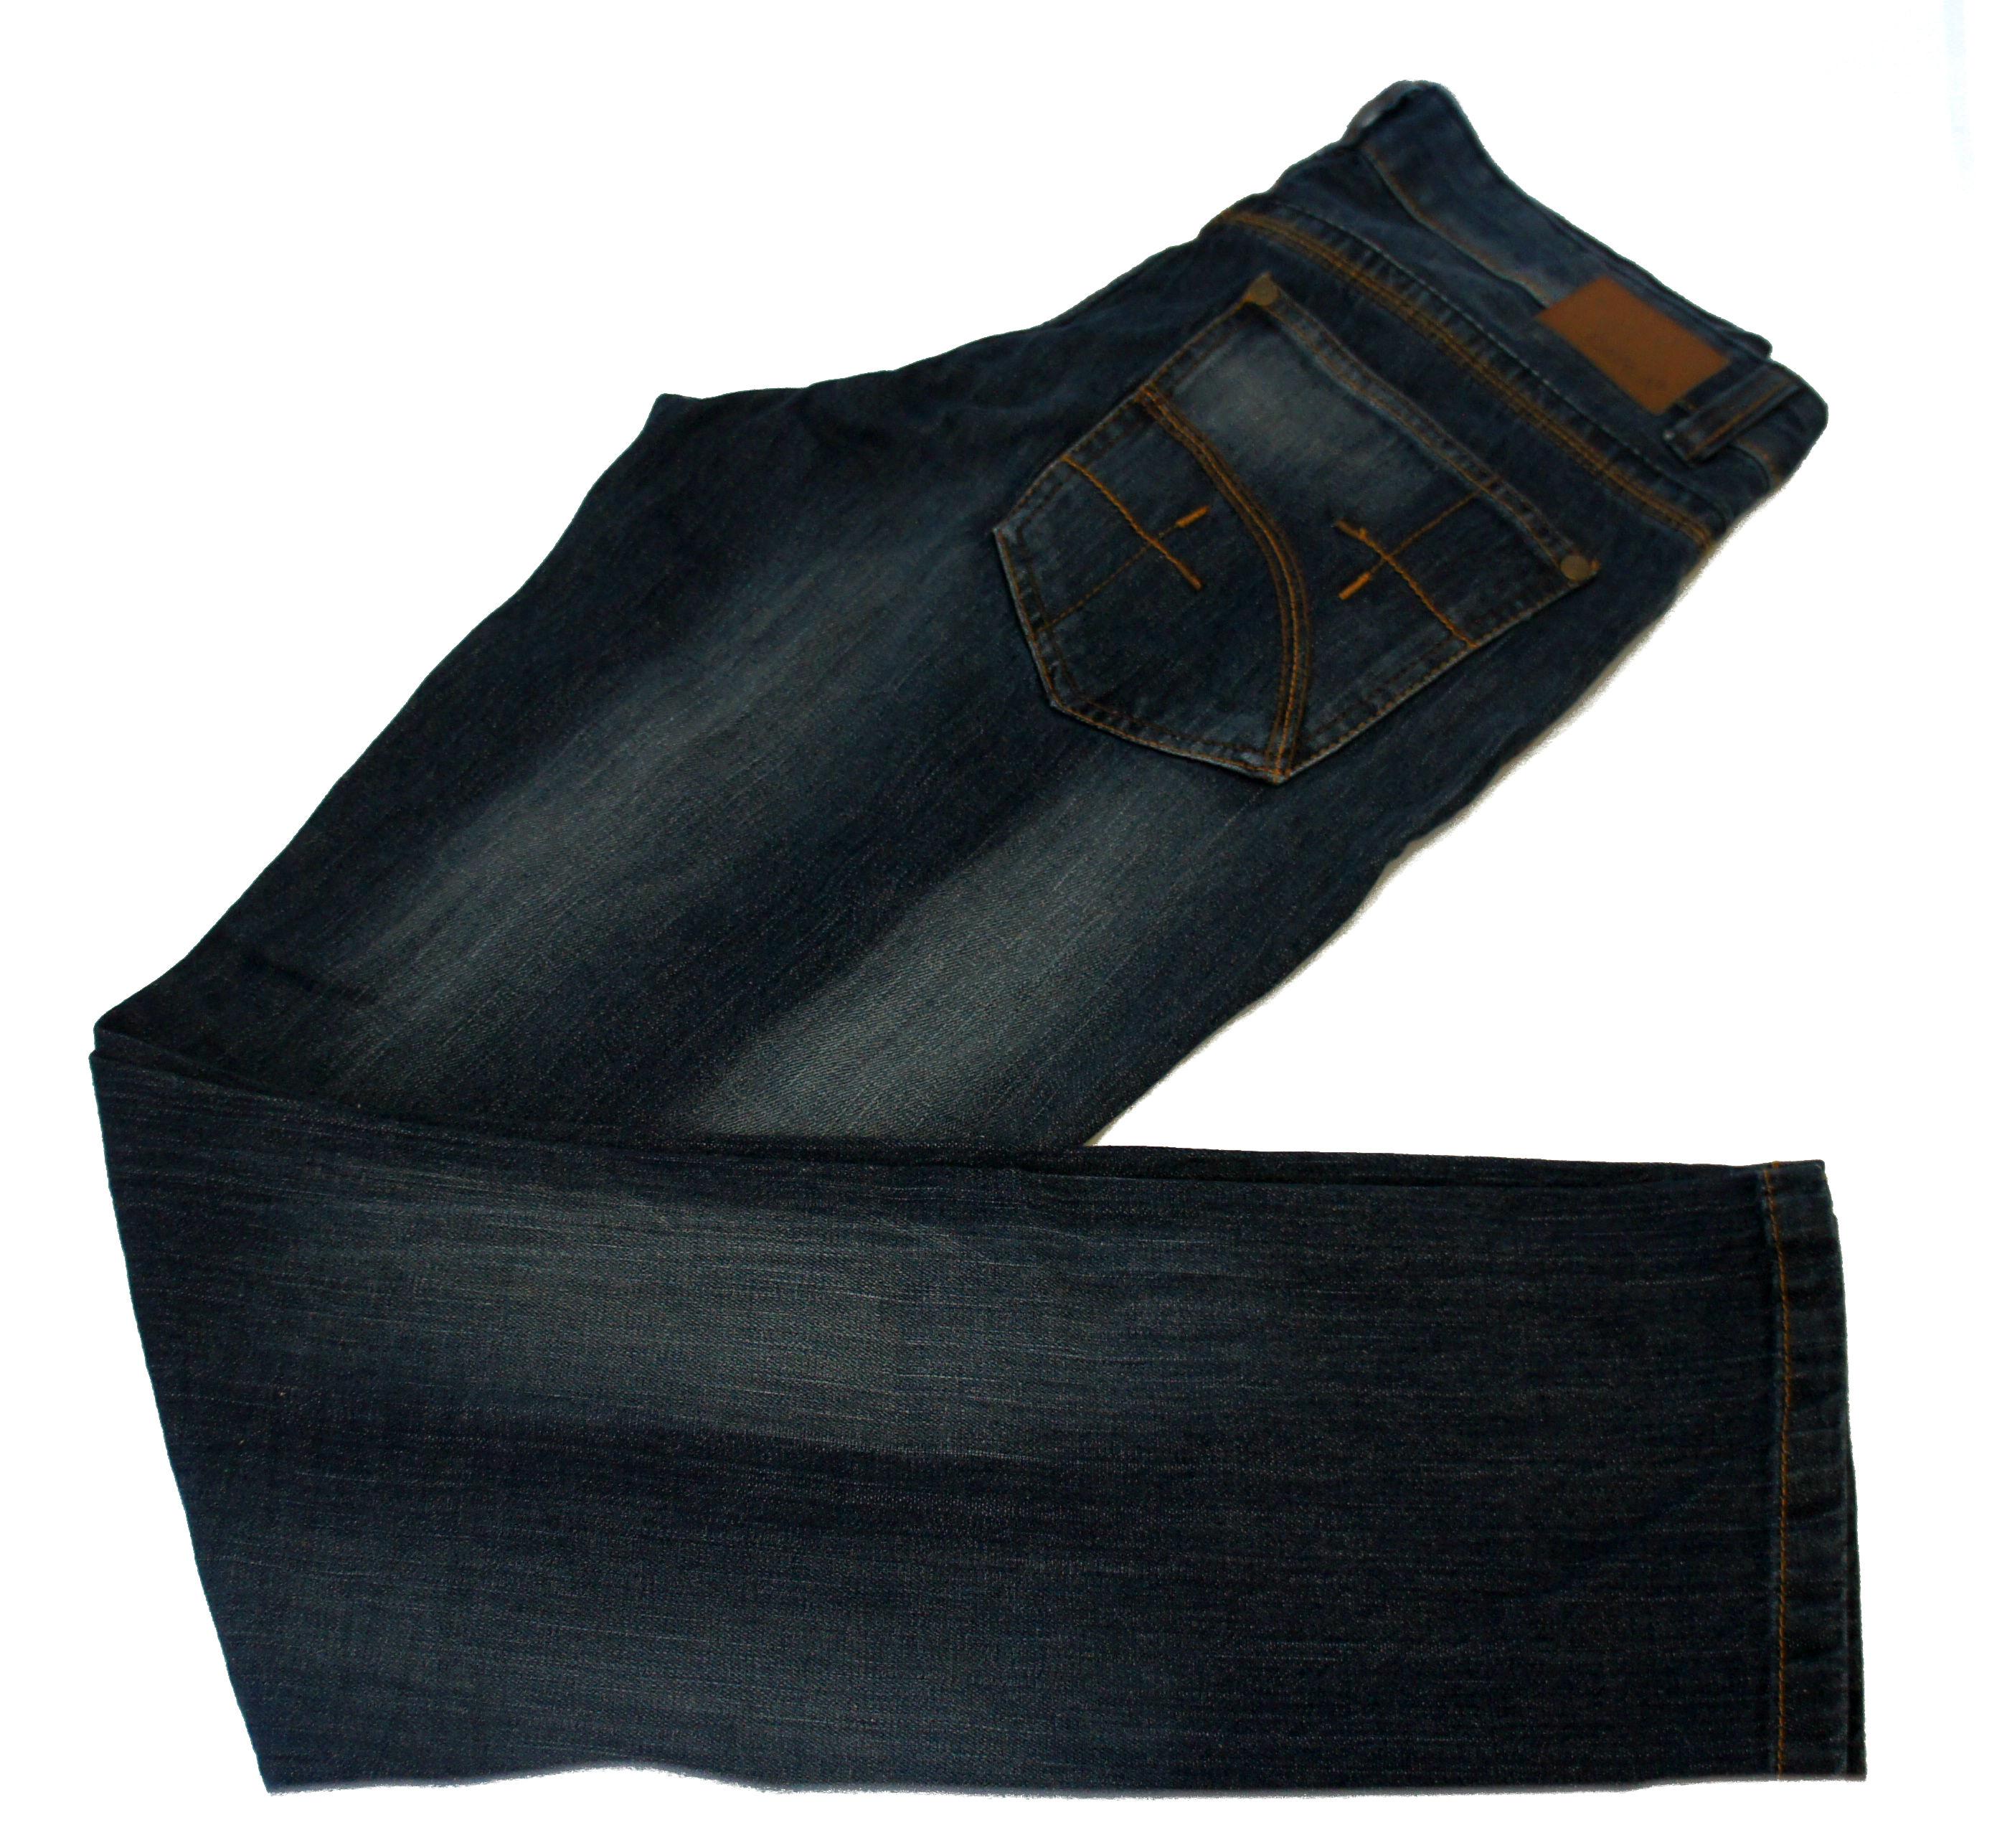 Damen-Stretch-Jeans-9-versch-Modelle-Jeanshose-Hose-Elasthan-bequem-Oko-Tex Indexbild 6